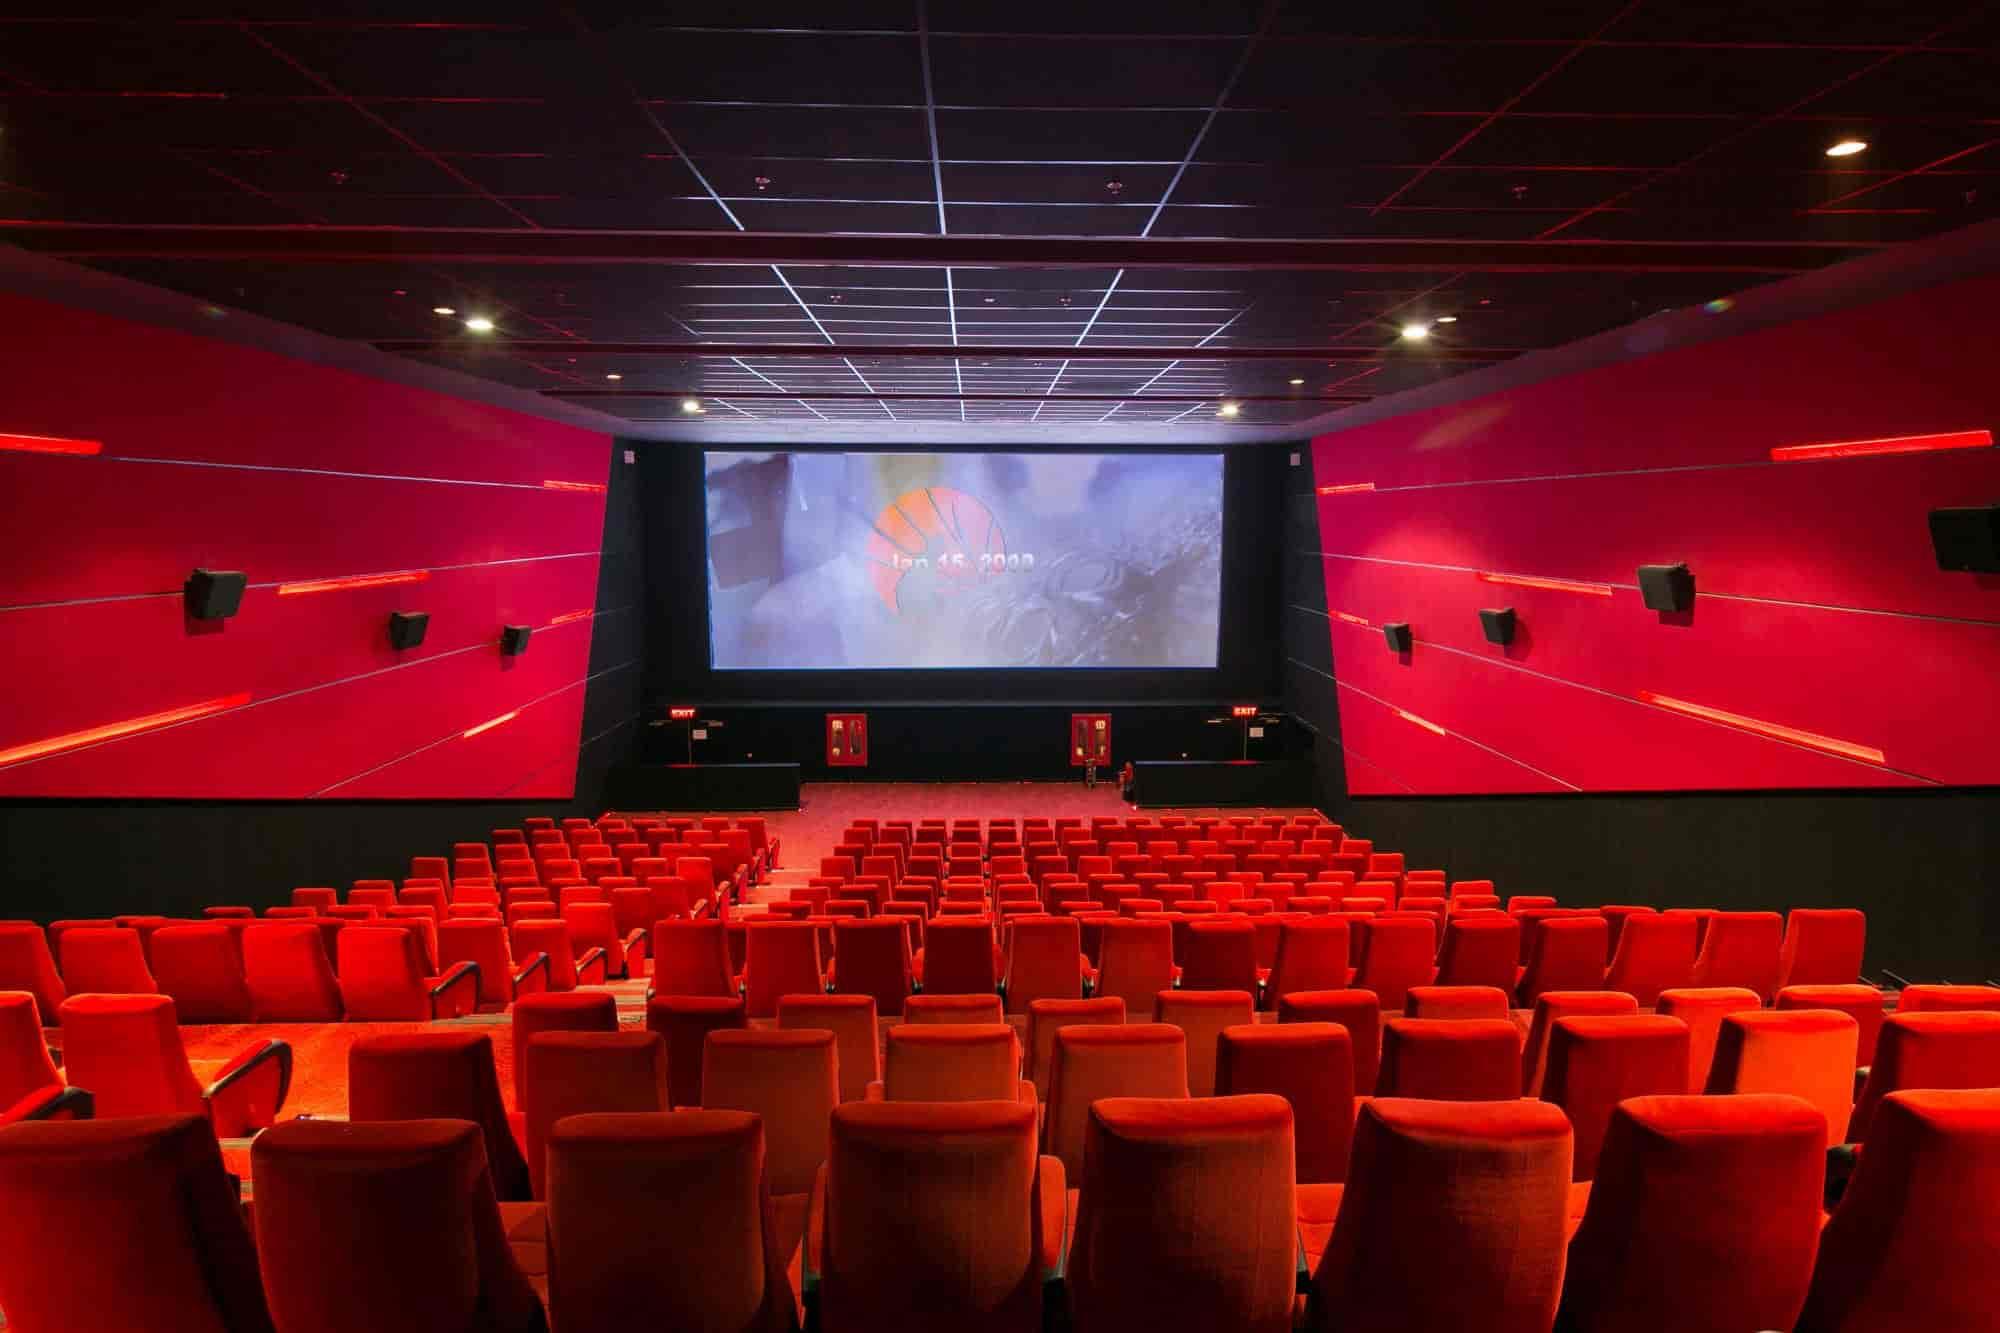 Pvr Cinemas Forum Sujana Mall Photos Kukatpally Hyderabad  -> Fotos De Cinemas